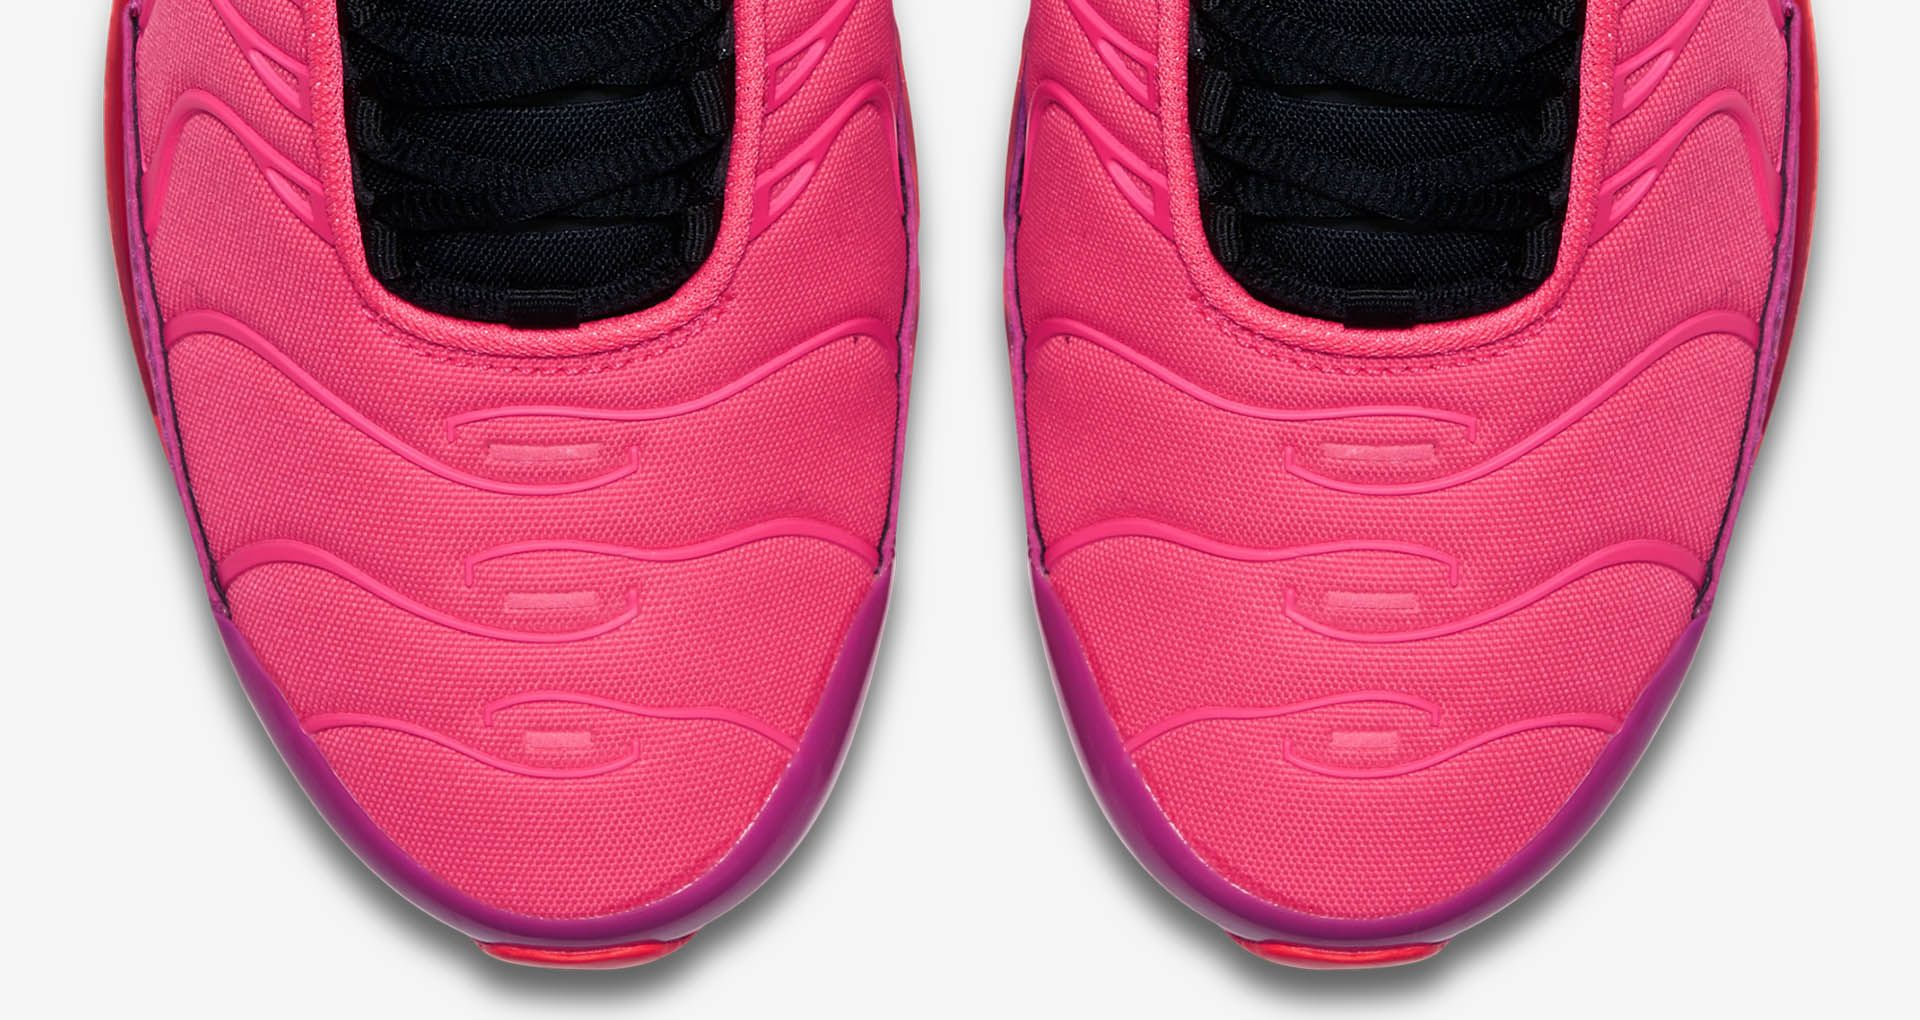 Nike Air Max 97 Plus Racer Pink Magenta Release Date